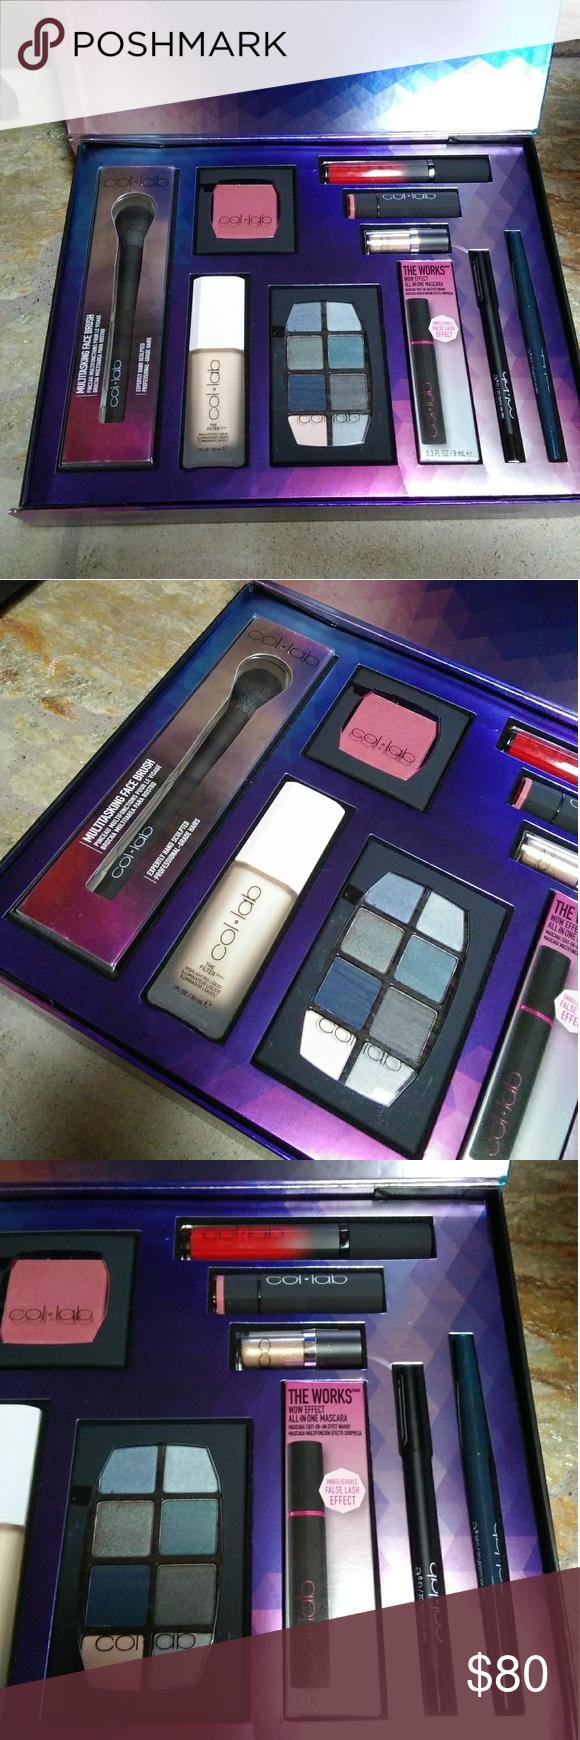 Col lab beauty 10 piece makeup gift set Makeup gift sets